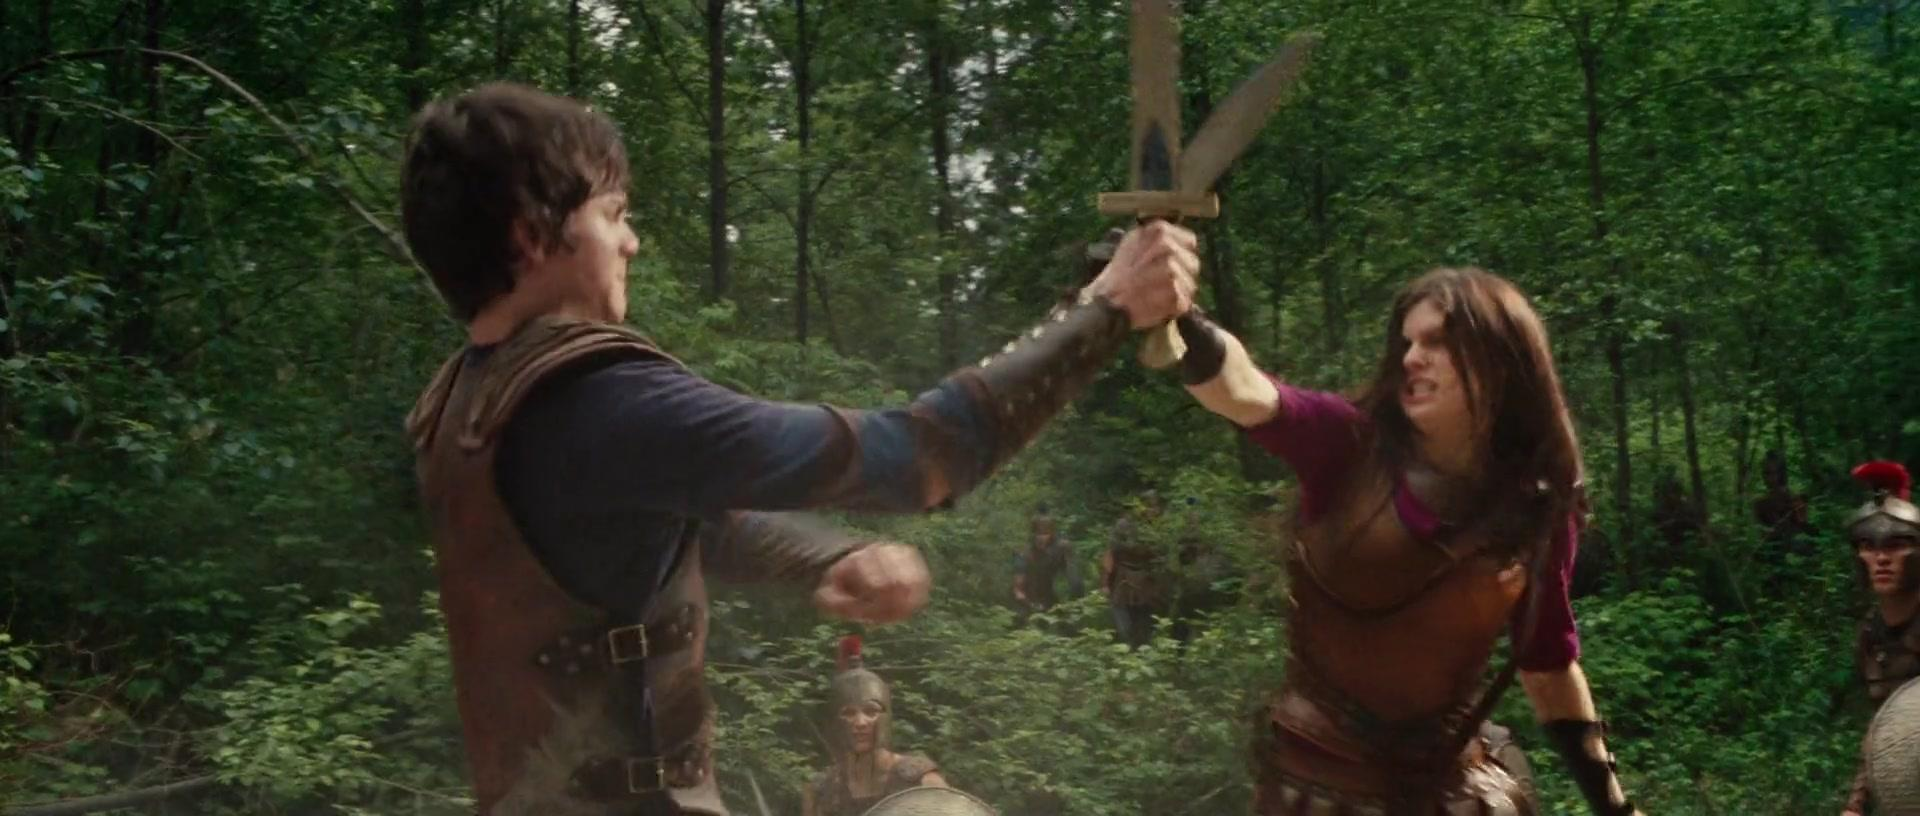 Percy Jackson & The Olympians The Lightning Thief (2010) 1080p BluRay [Hindi+English]